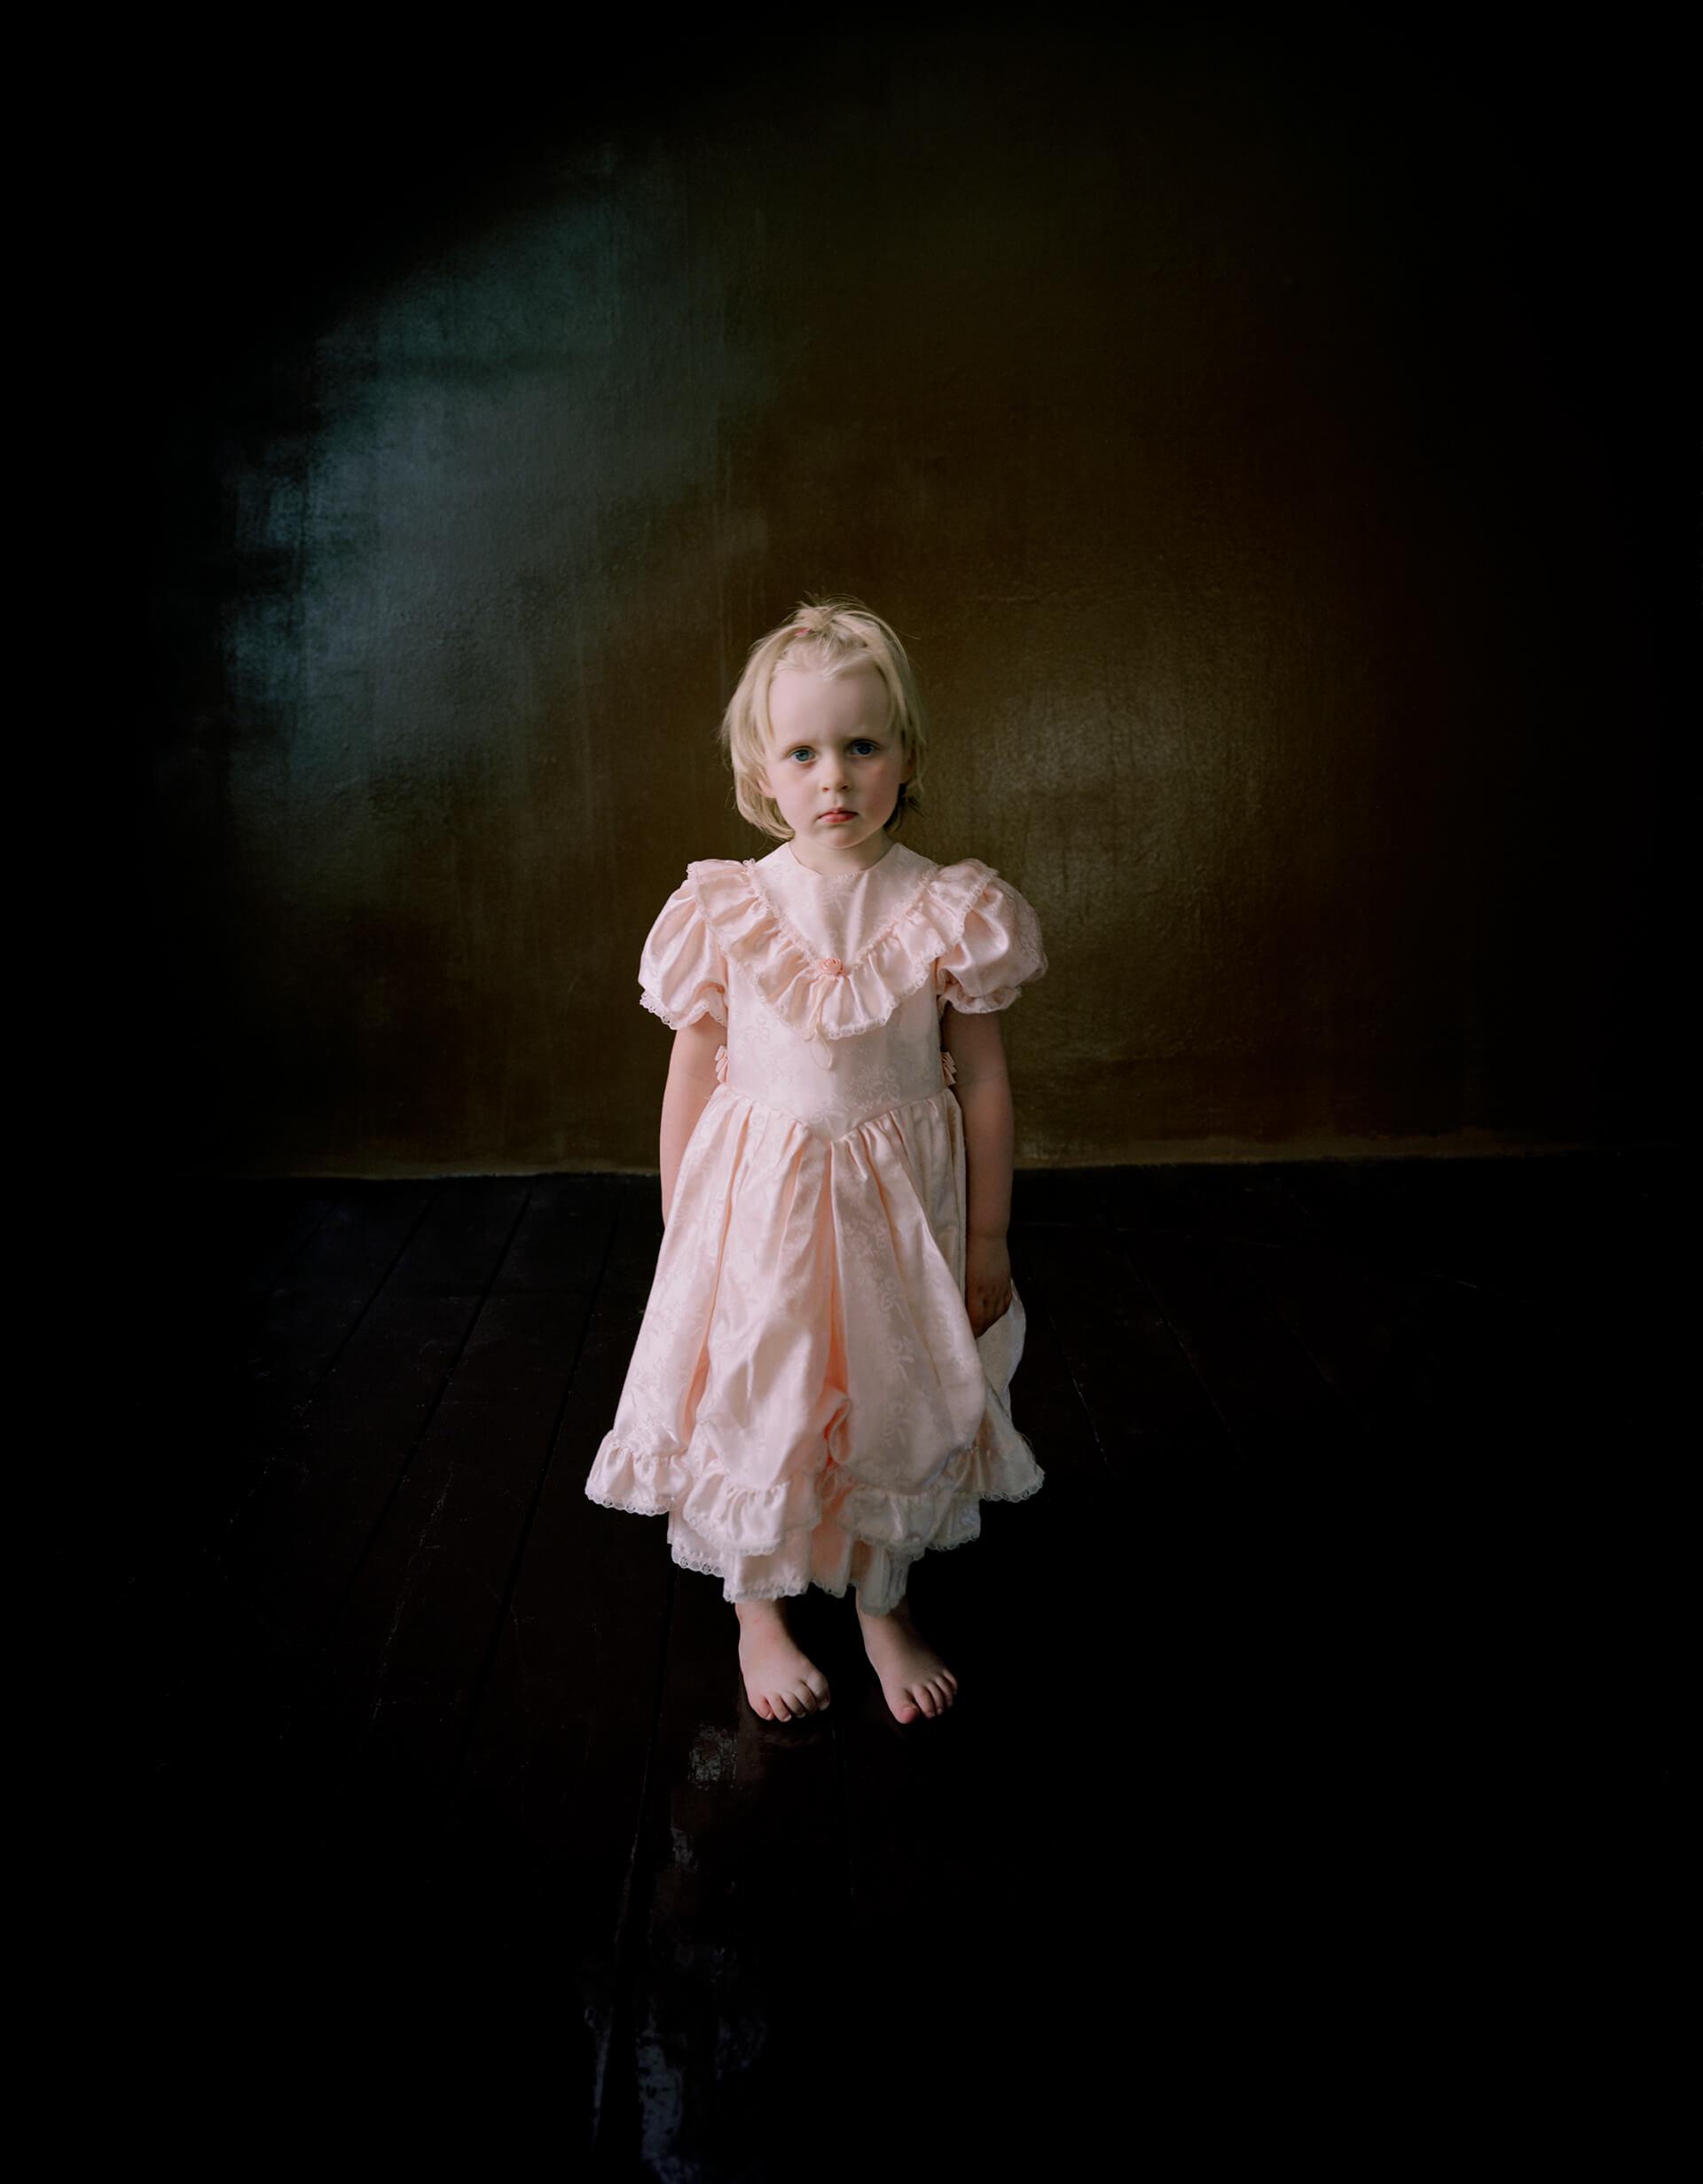 Introducing Viola Pernille Koldbech Fich Portrait #2